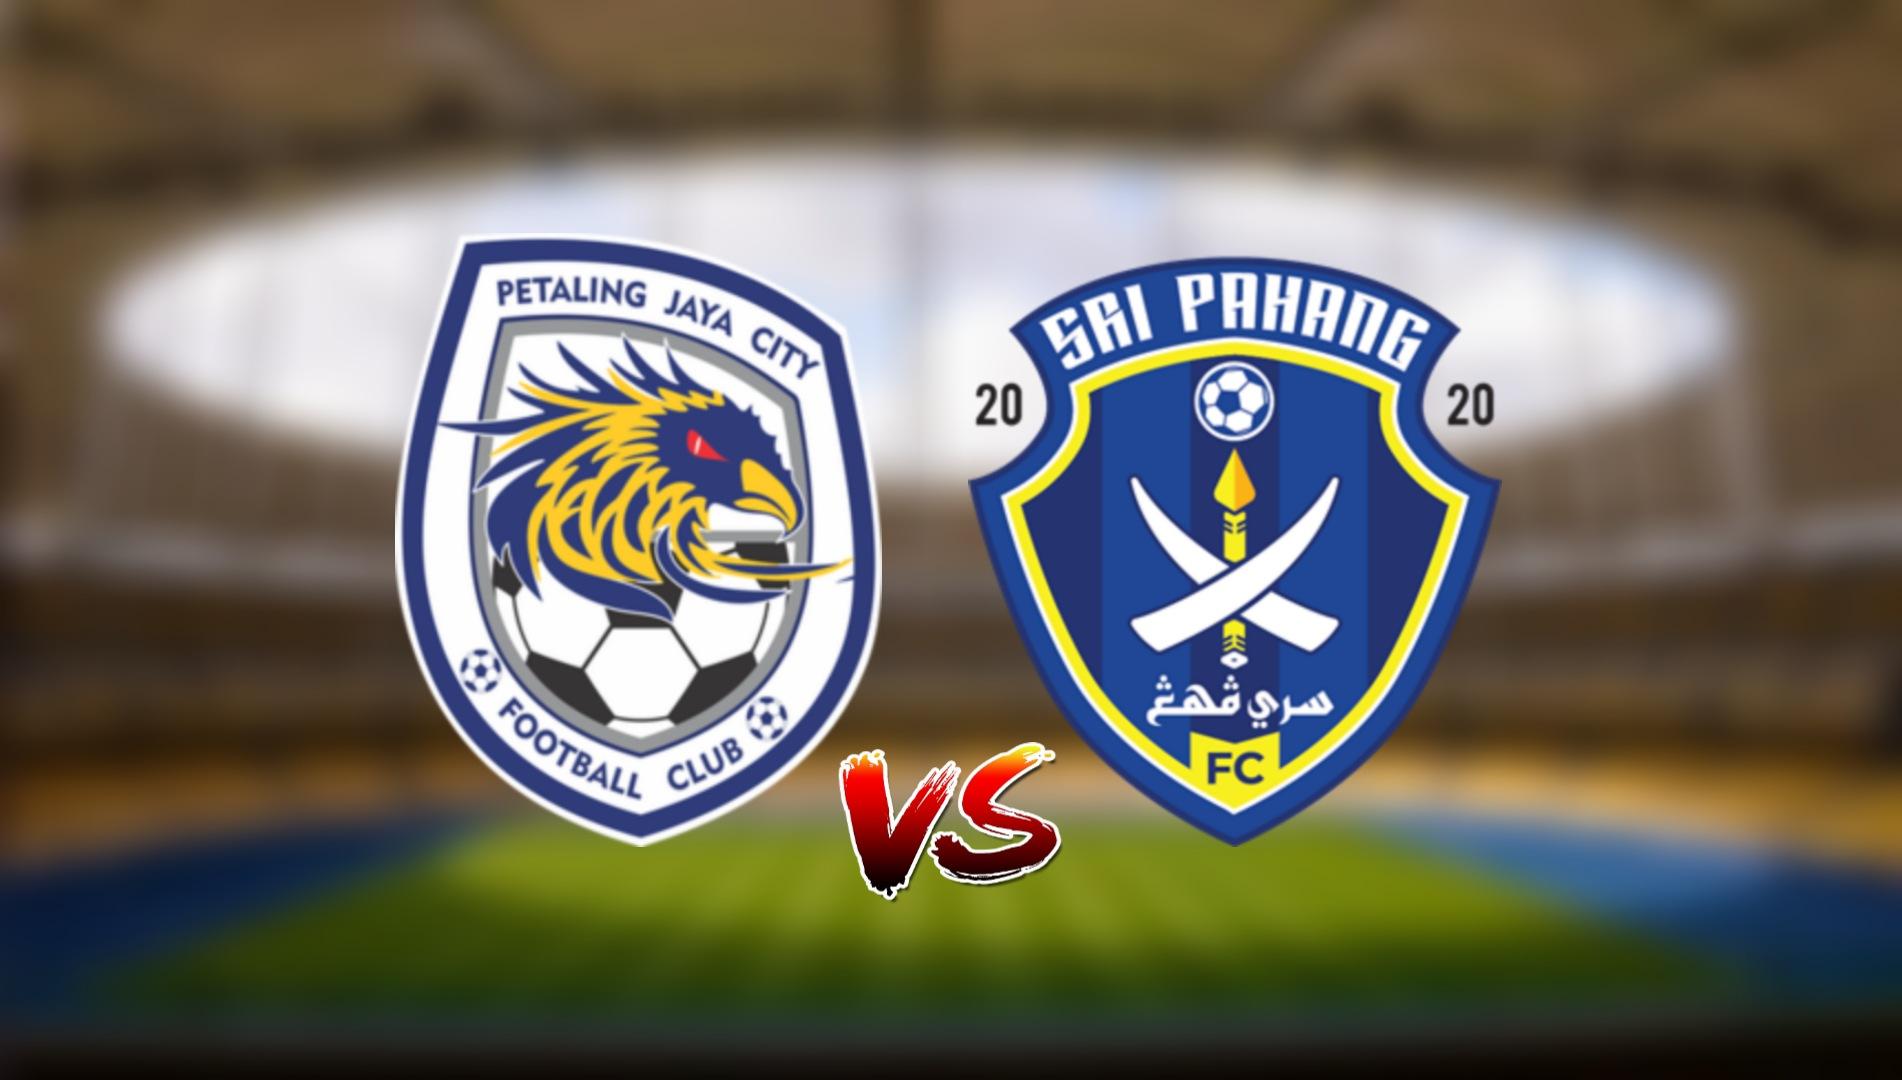 Live Streaming PJ City FC vs Sri Pahang FC Liga Super 21.3.2021